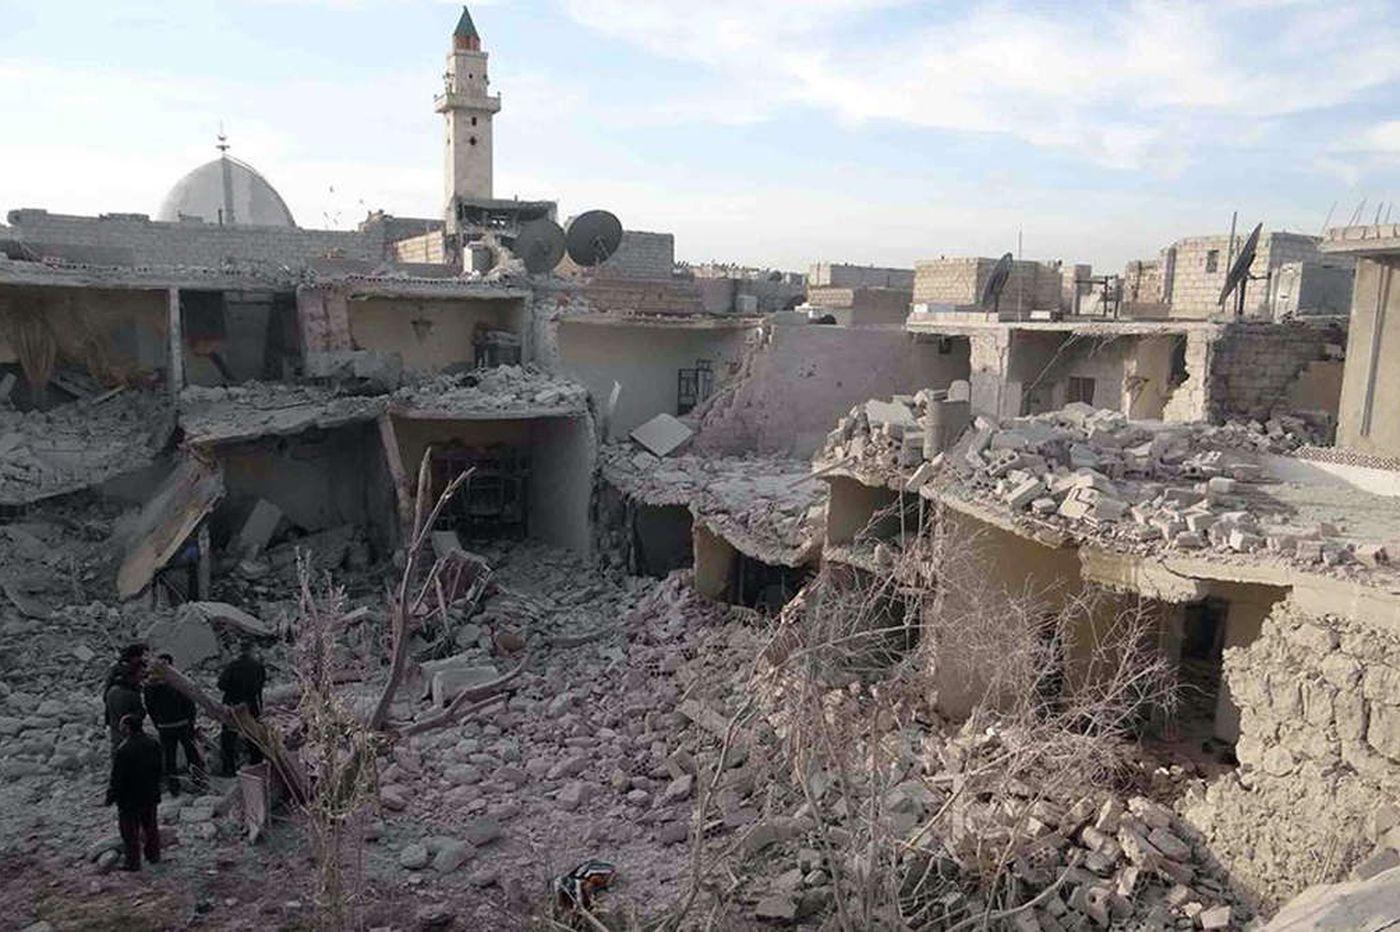 Syrian rebel chief urges unity ahead of talks